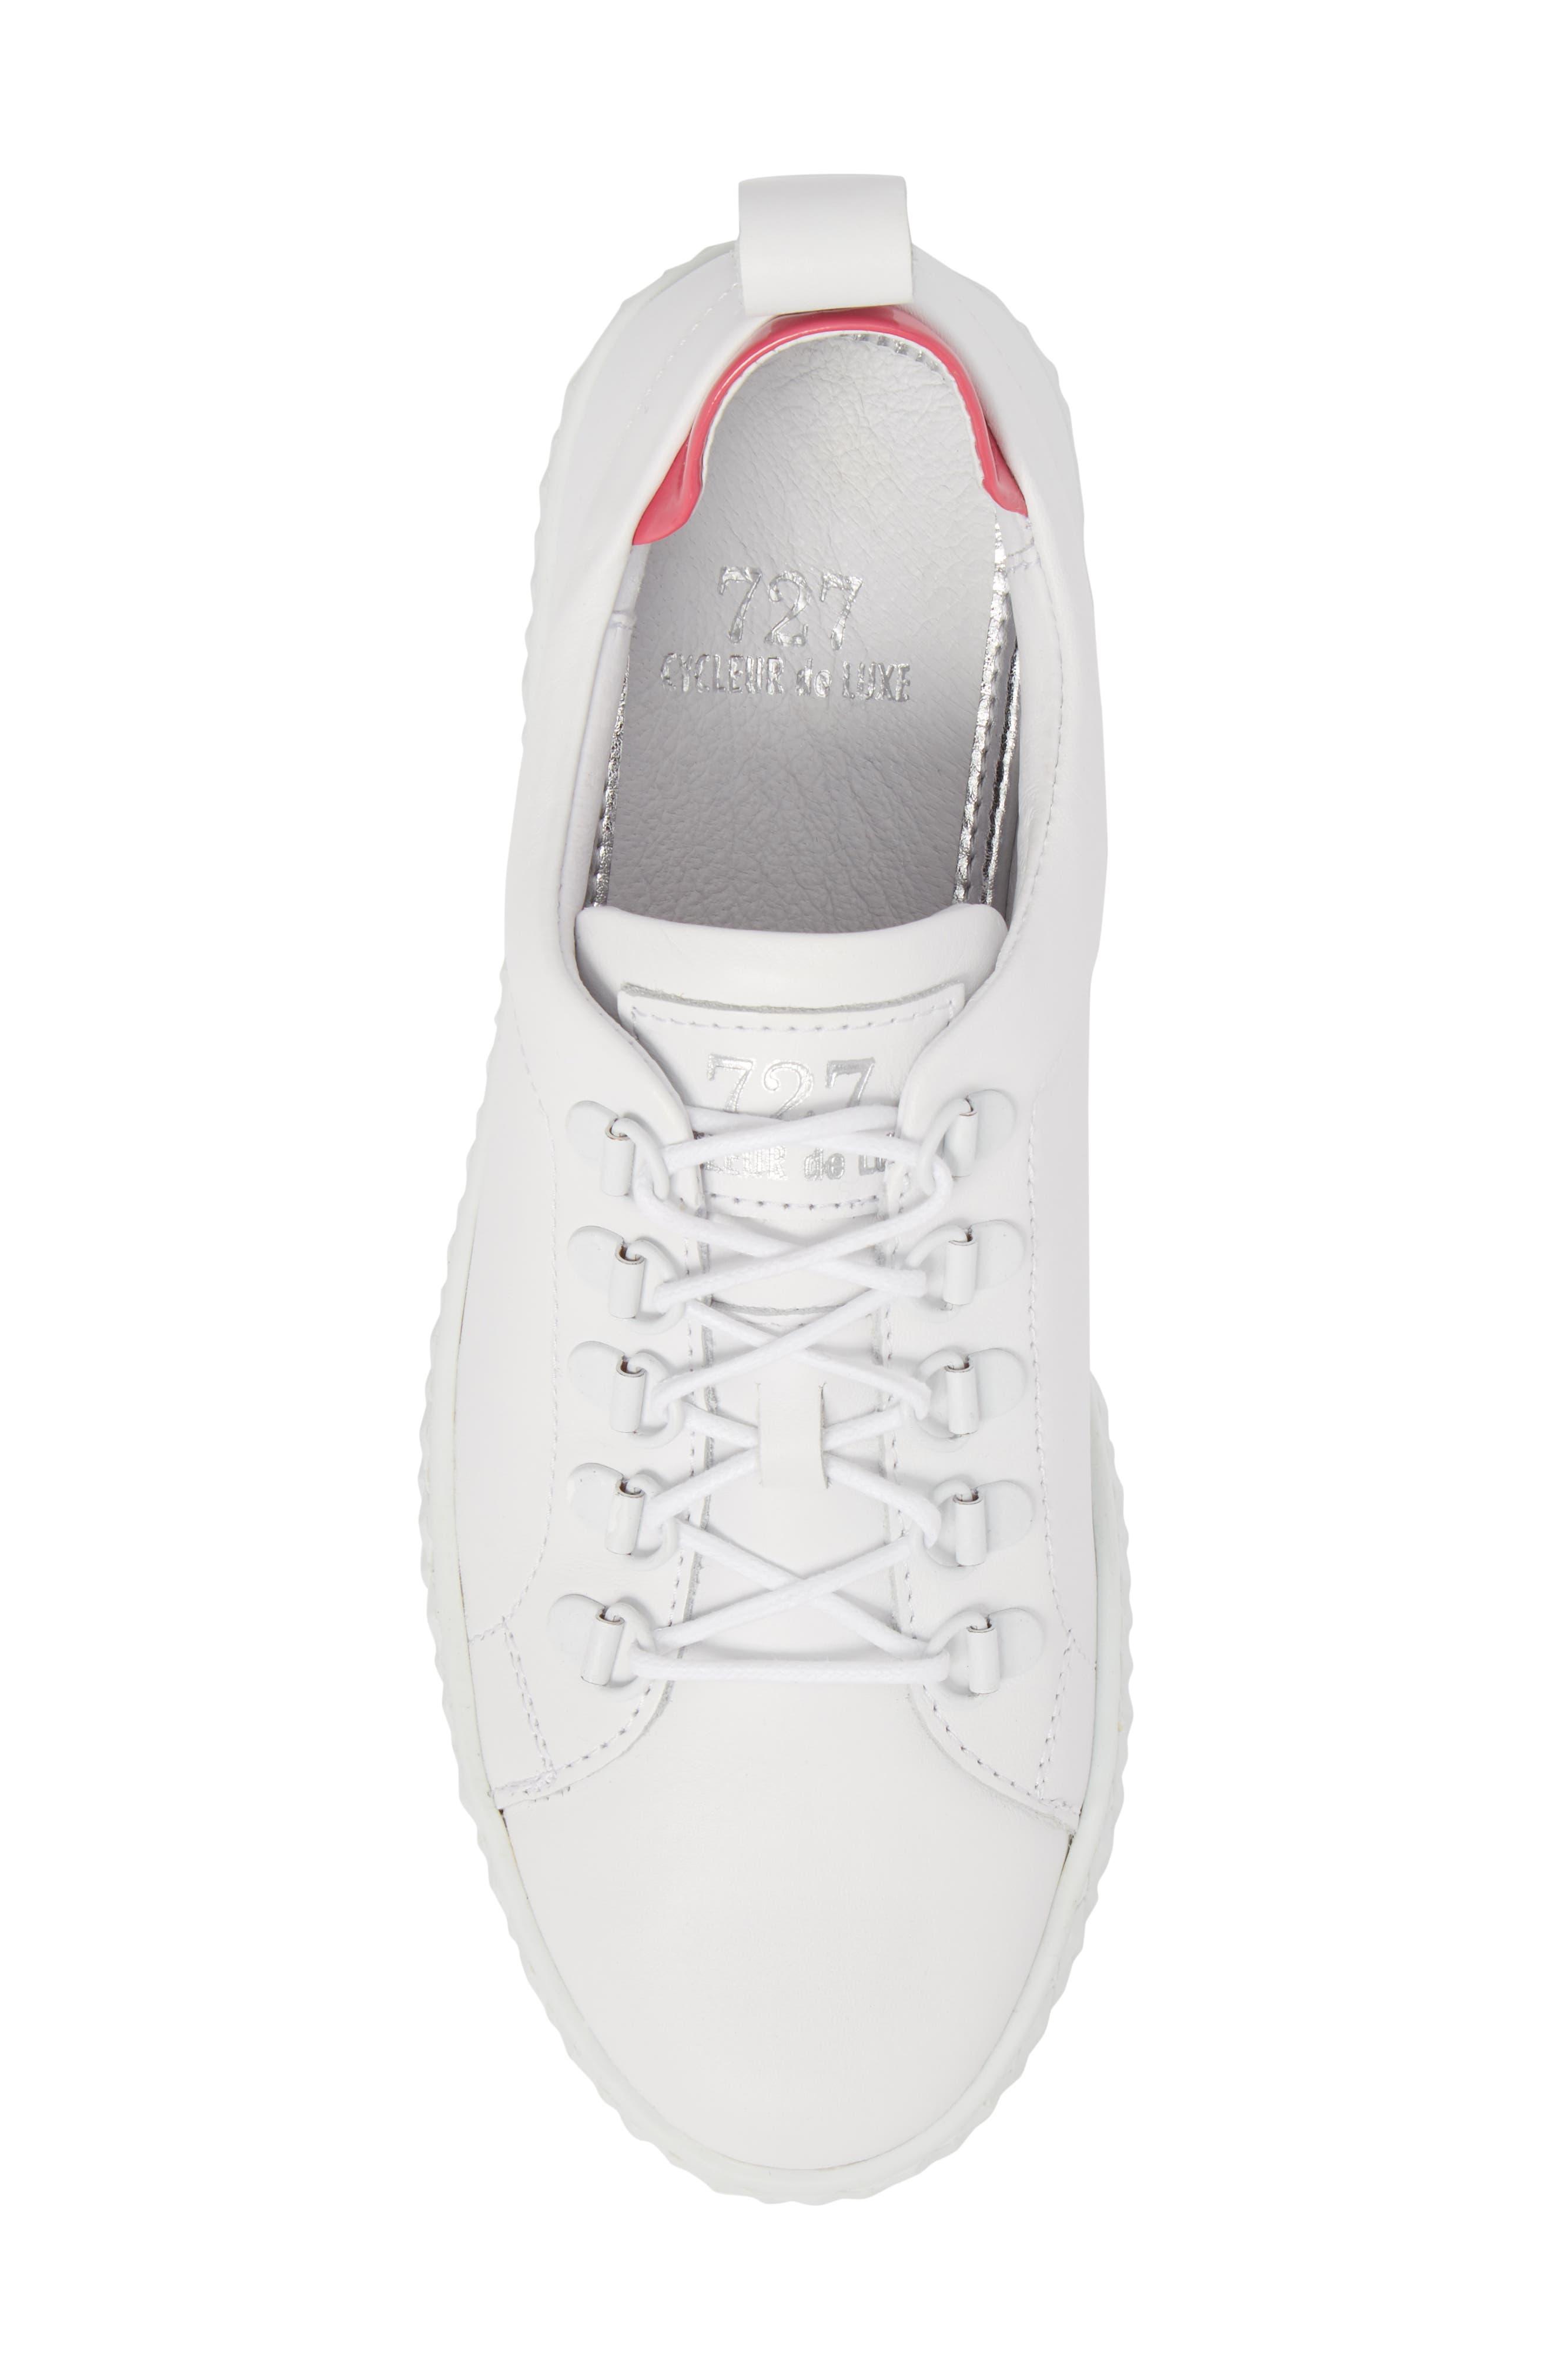 Sol Sneaker,                             Alternate thumbnail 5, color,                             Optic White/ Fuchsia Leather